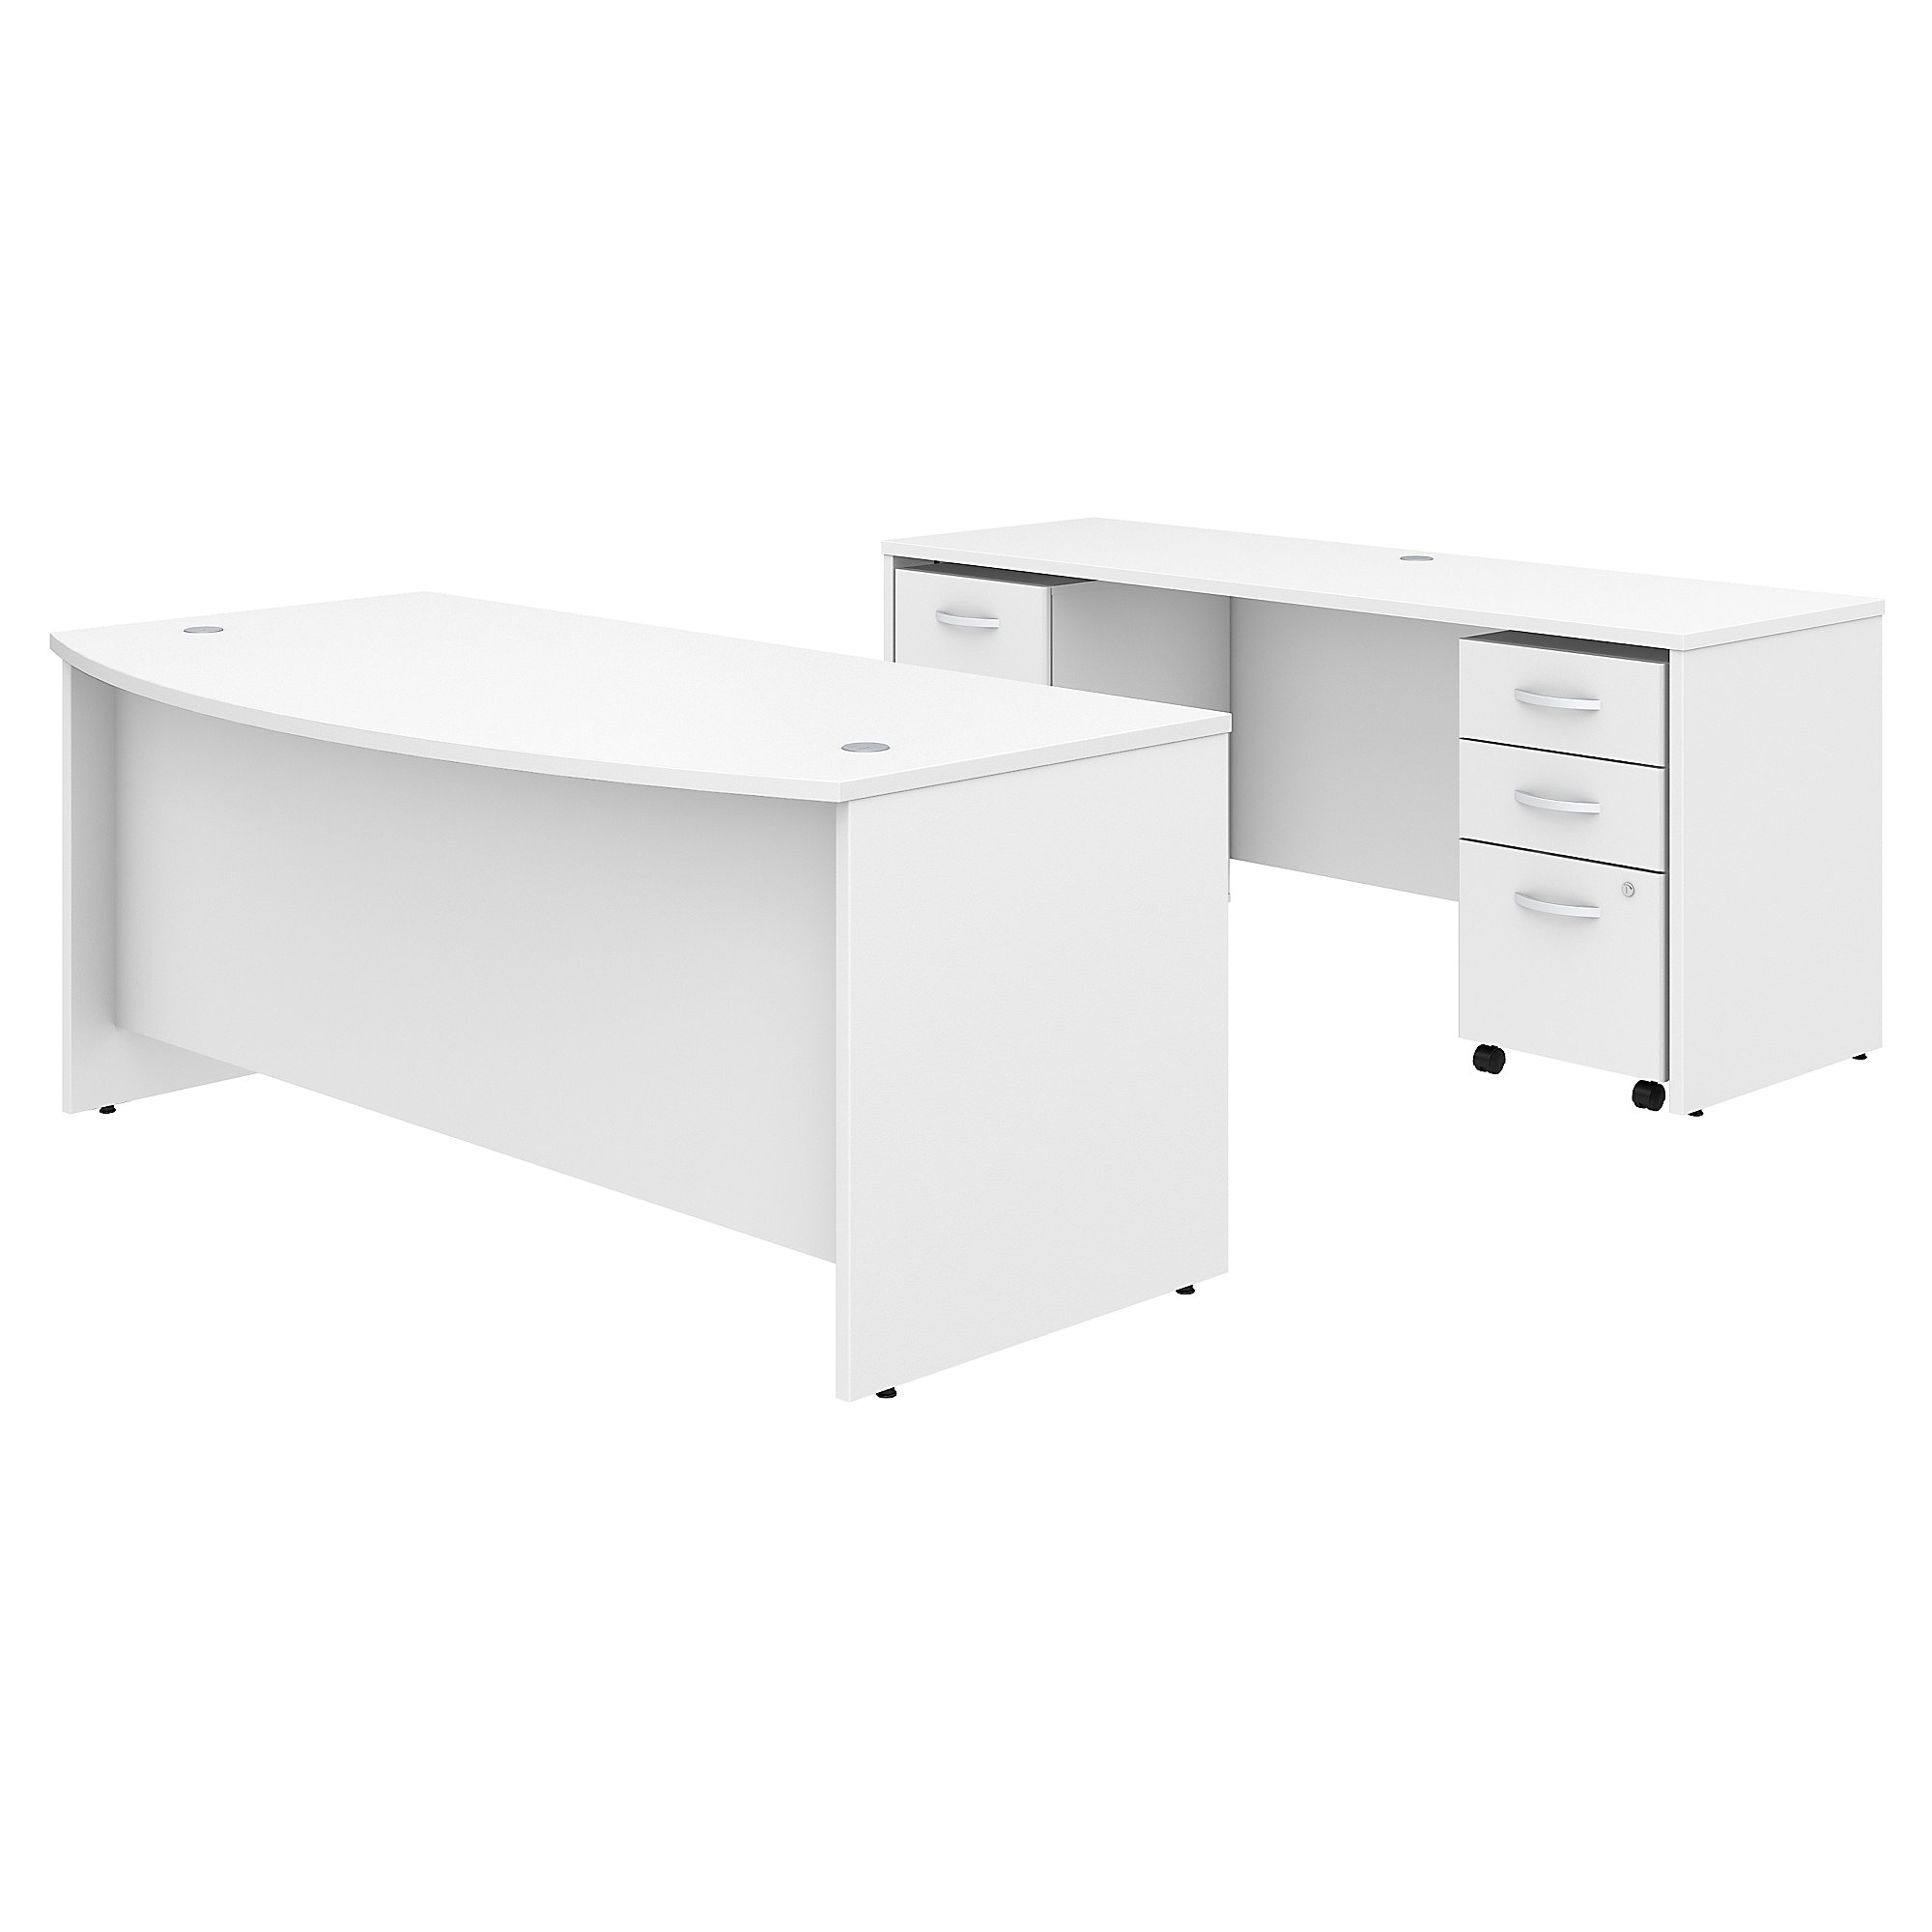 "Bush Business Furniture Studio C Bow Front Desk and Credenza with Mobile File Cabinets, 72""W x 36""D, White, Premium Installation"